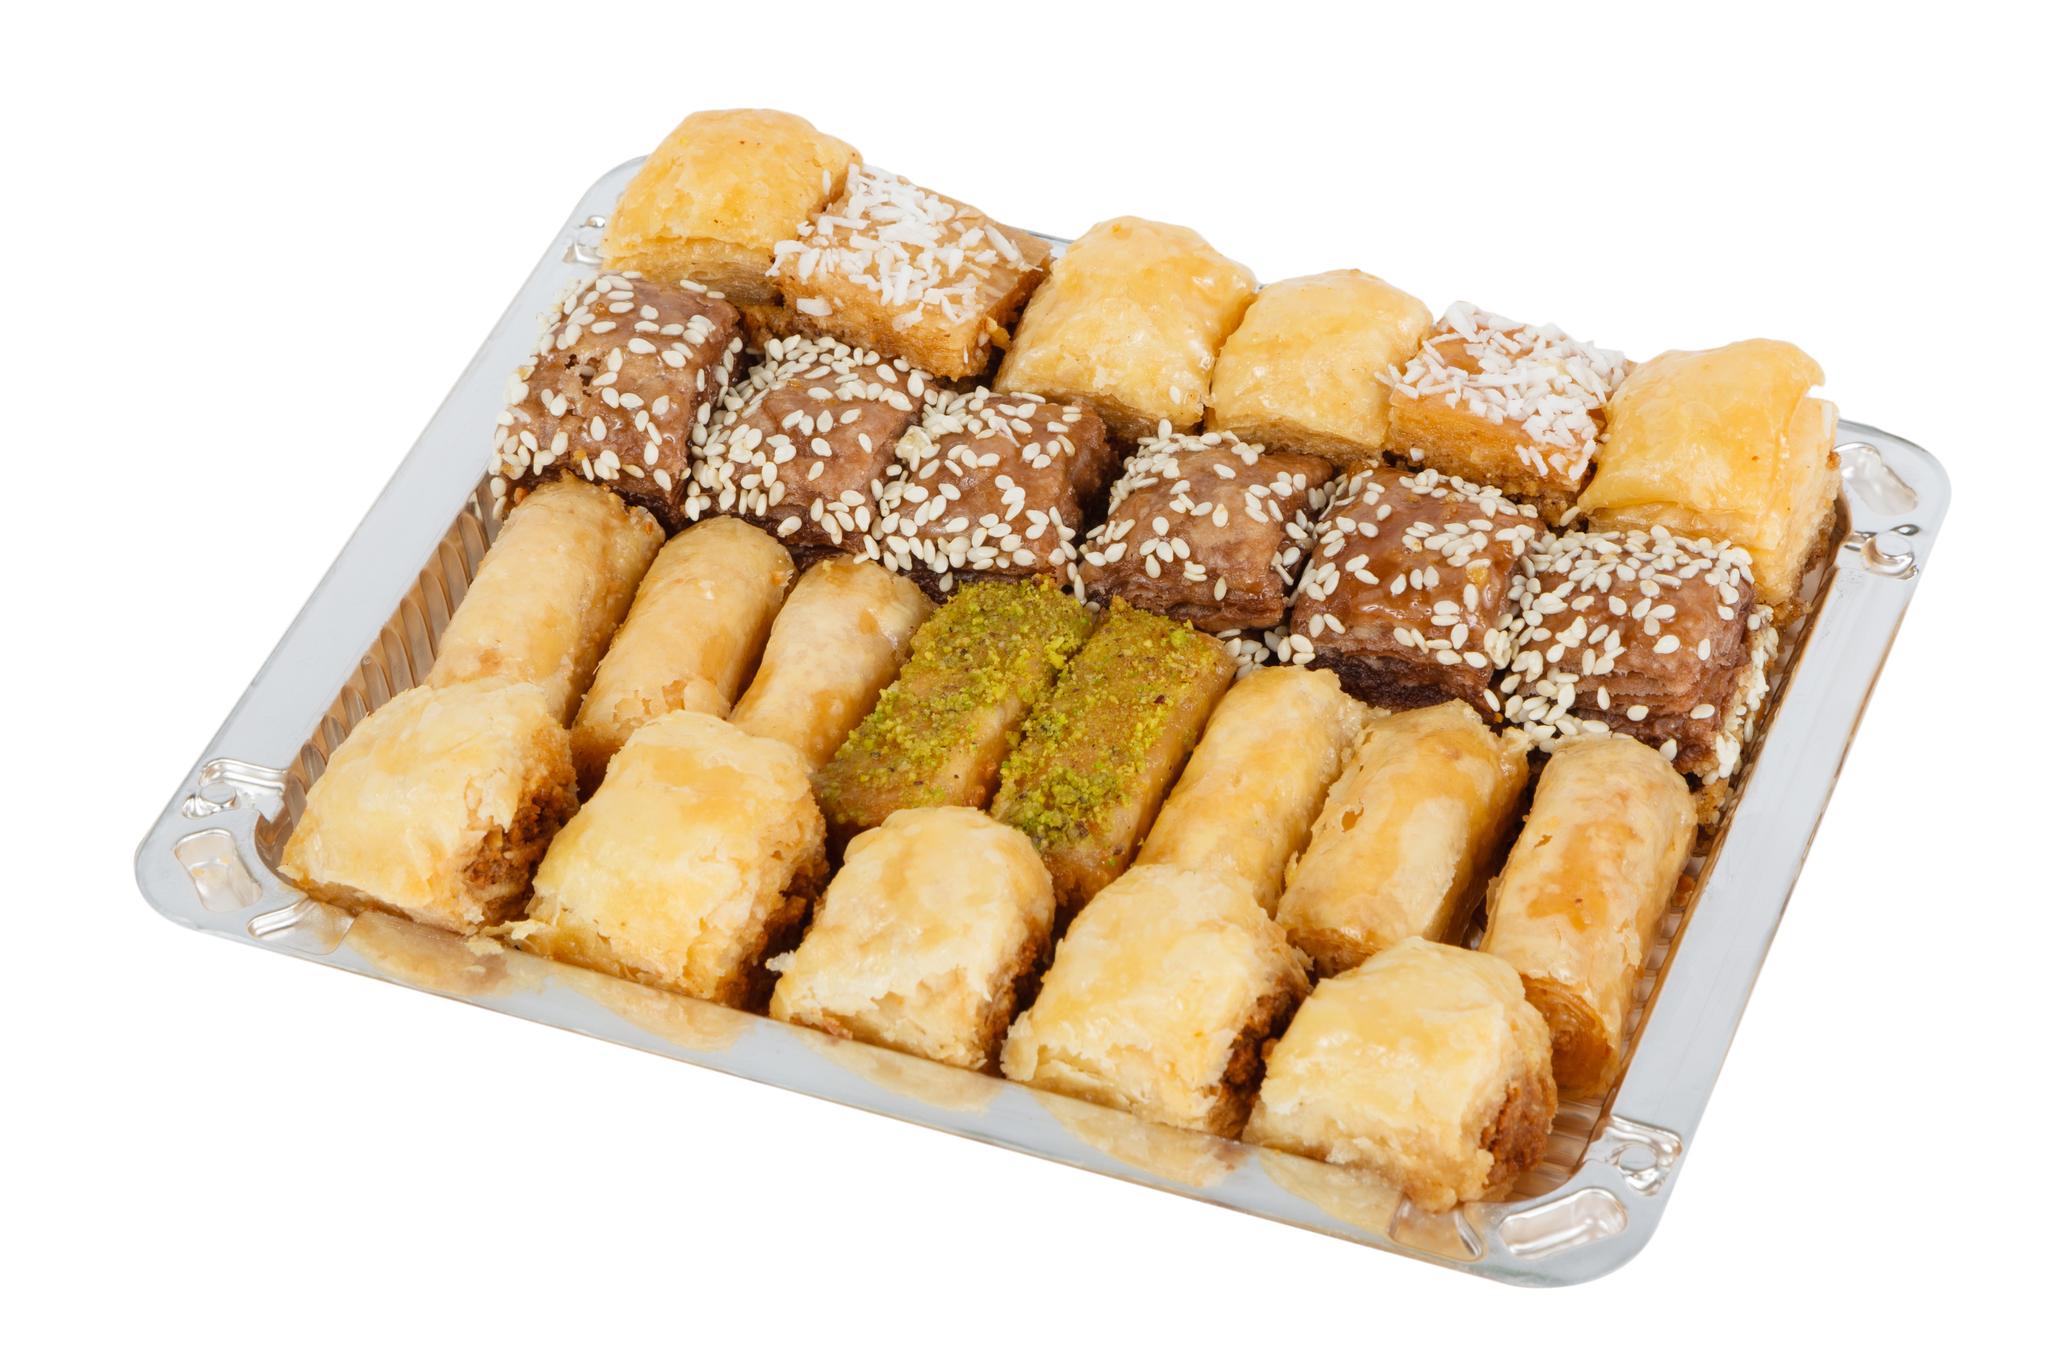 "Pate D'or Пахлава - ассорти ливанских сладостей ""Финикия"", 350 г import_files_84_84b20a3c787e11e799f3606c664b1de1_eb067e2cae8911e7b011fcaa1488e48f.jpg"